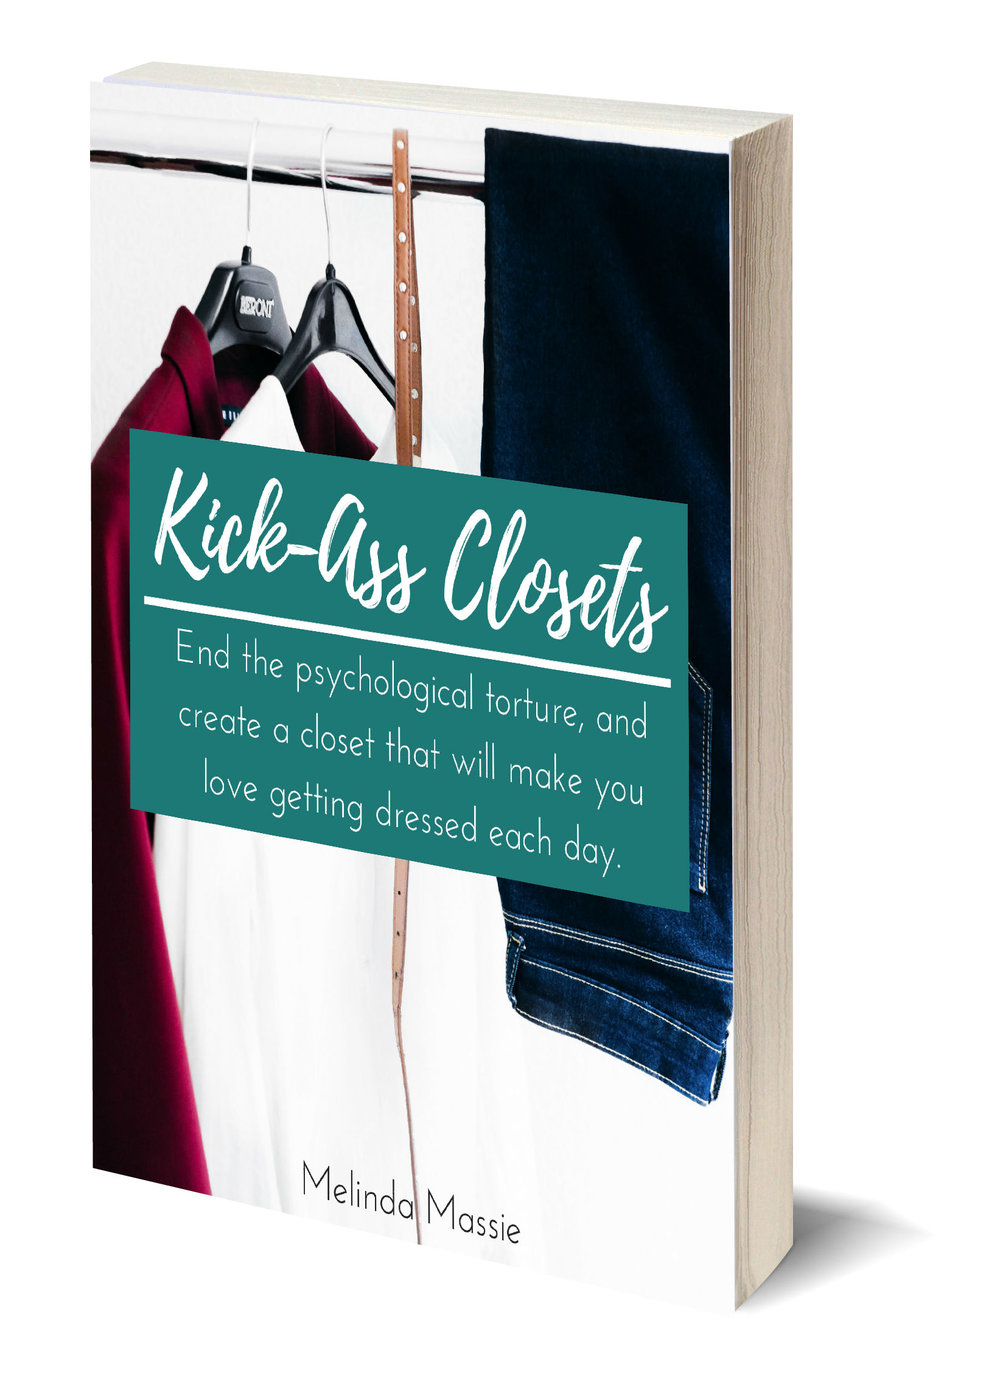 Kick Ass Closets - A Side of Fabulous